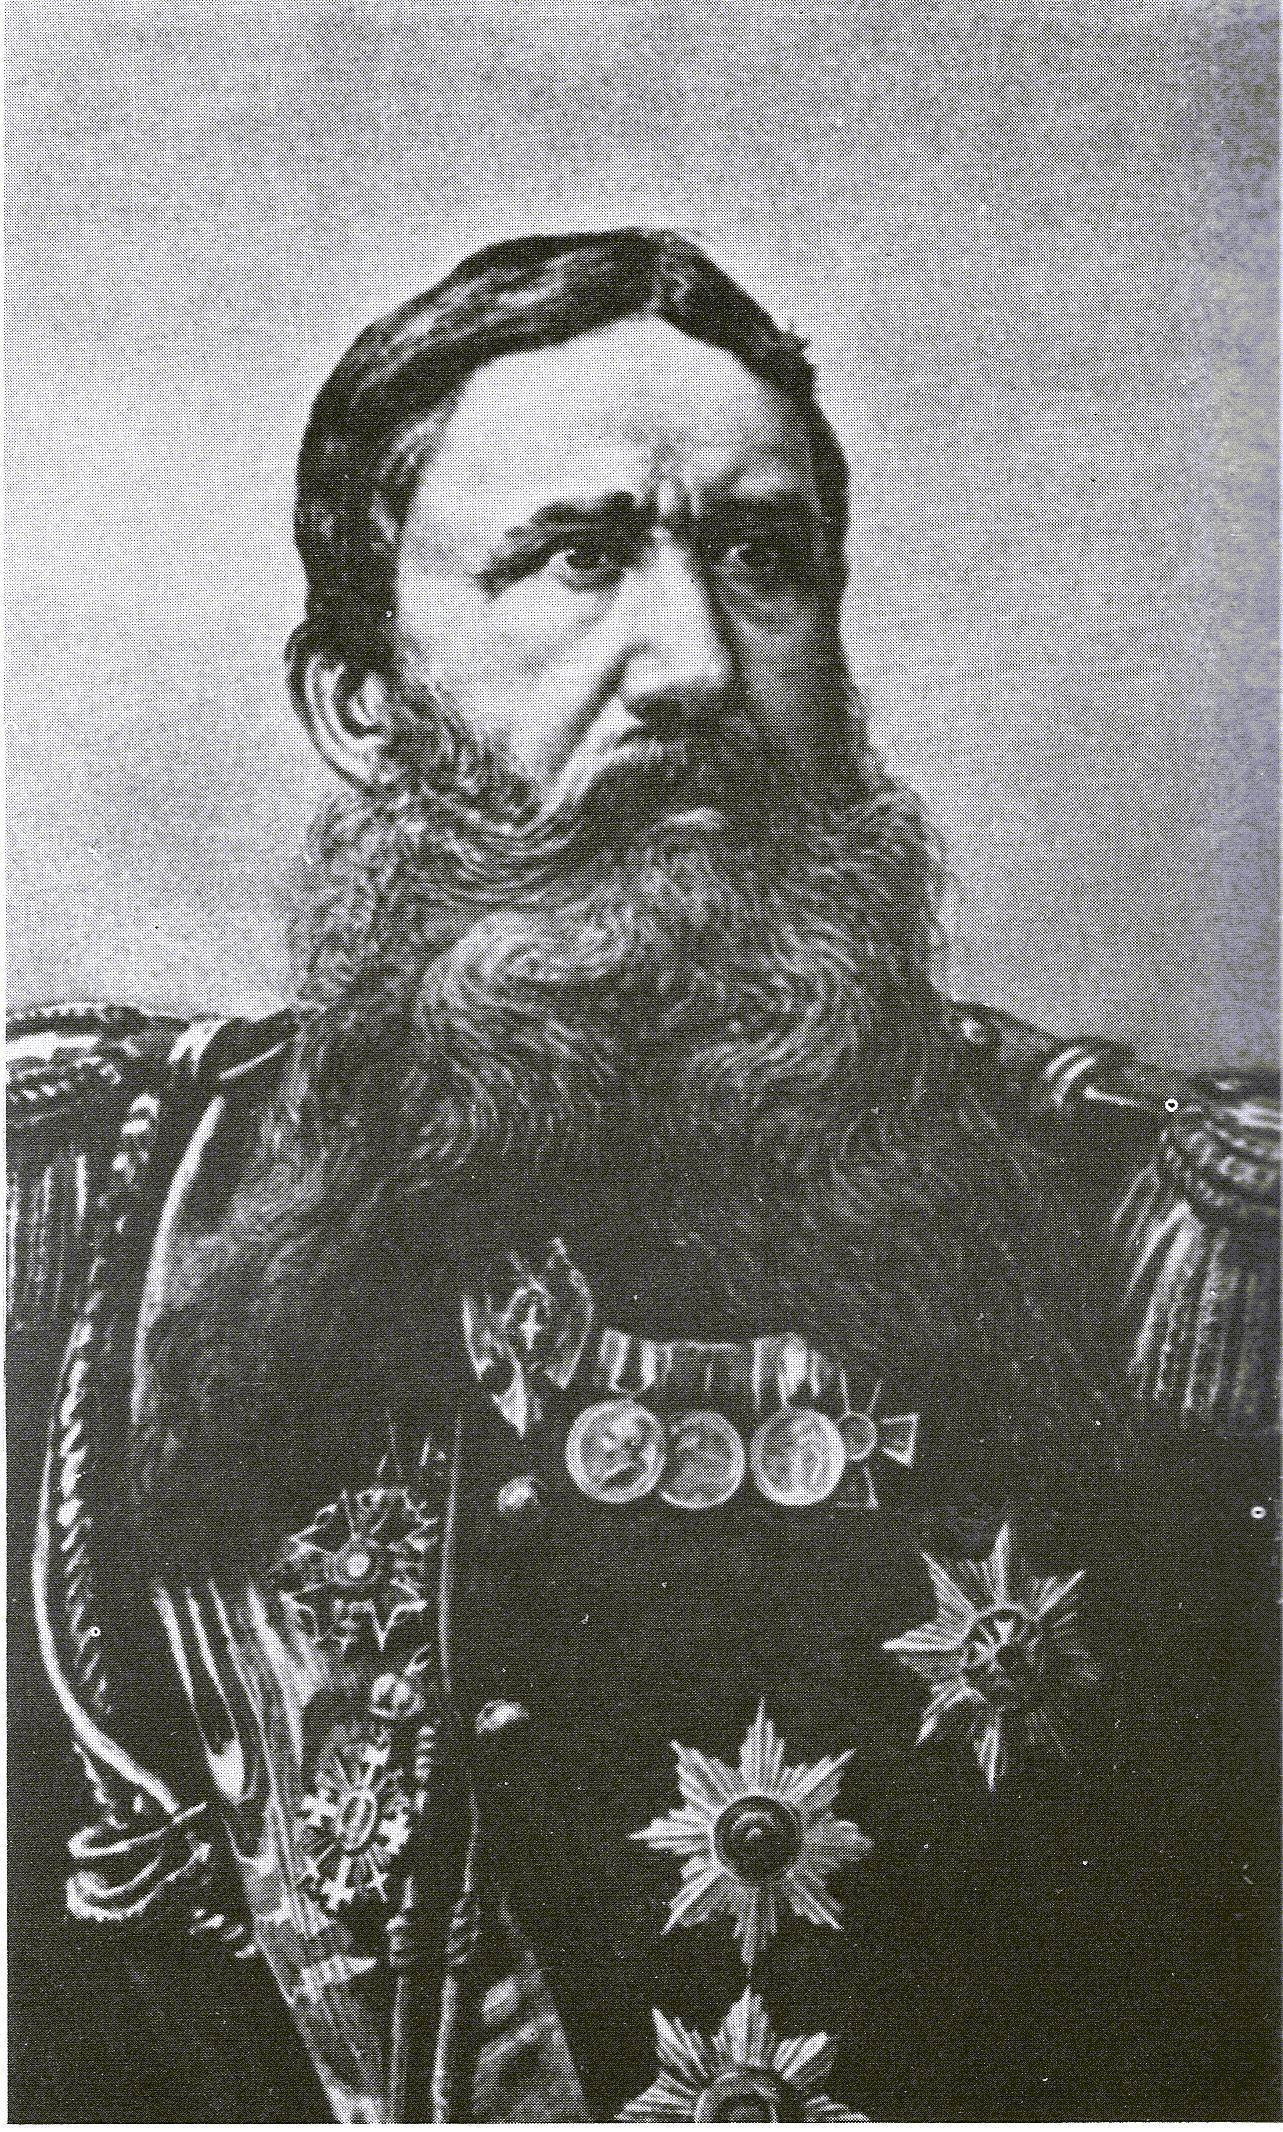 https://upload.wikimedia.org/wikipedia/sr/a/ae/General_Horvatovic.jpg